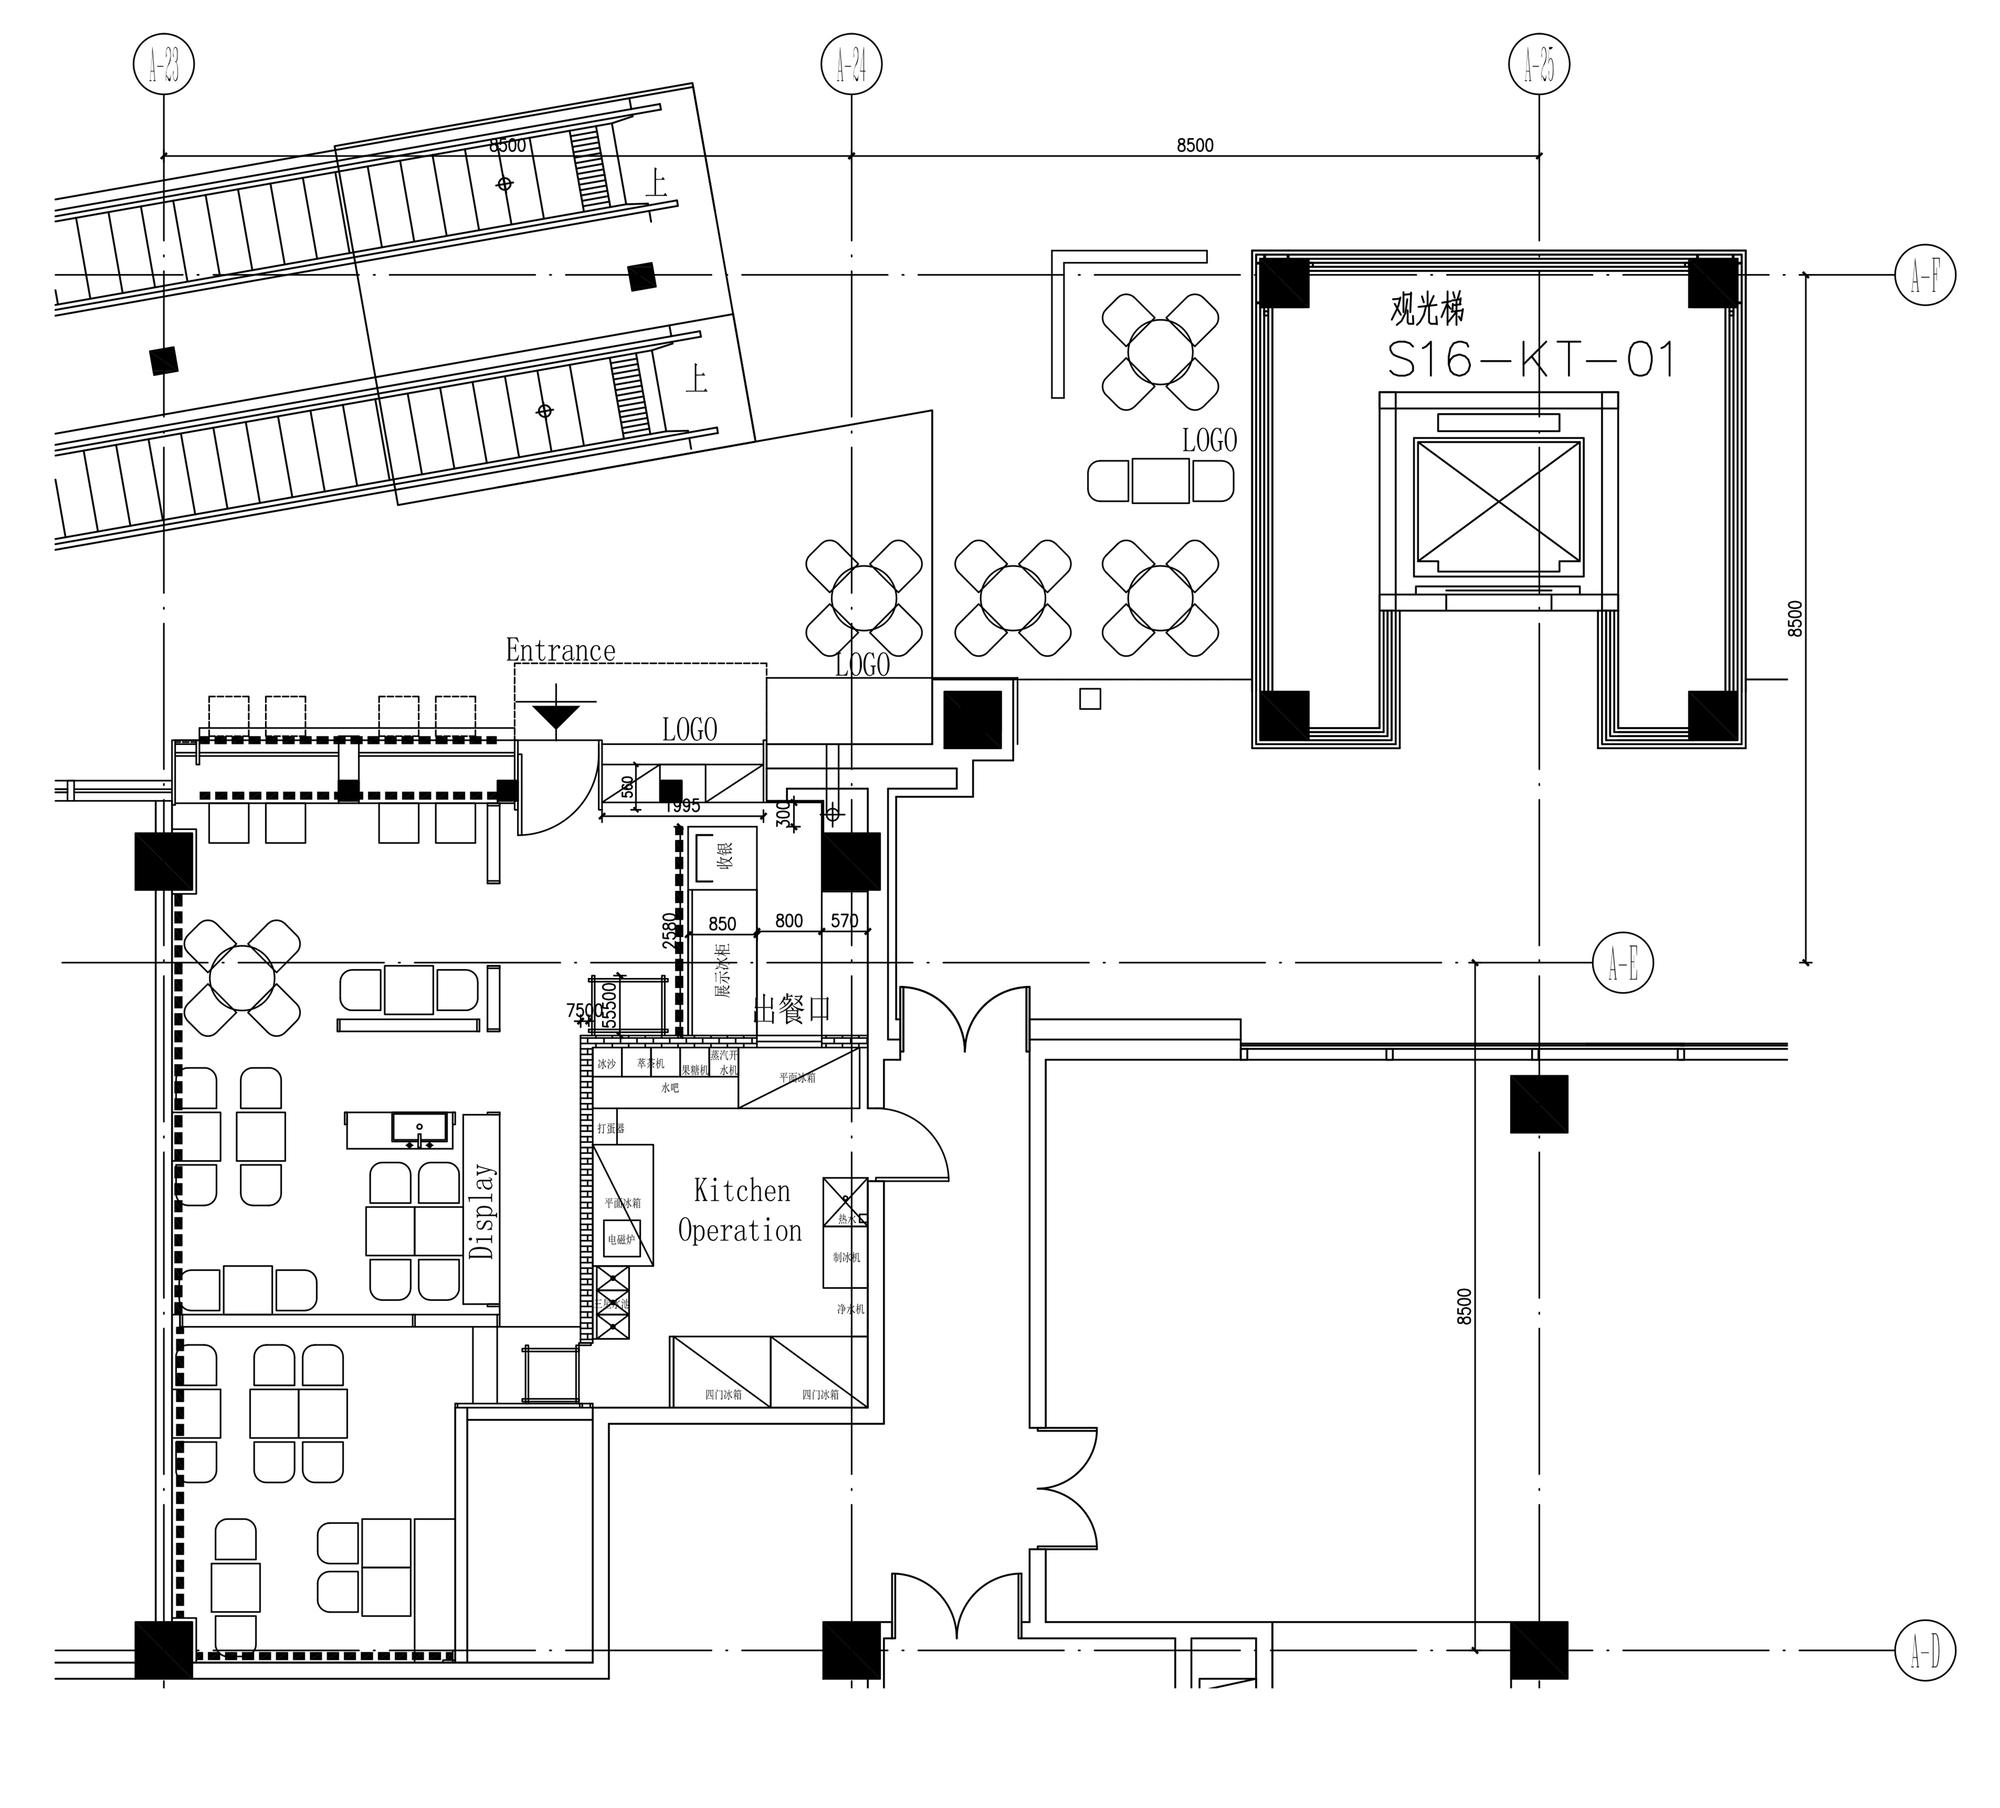 Gallery Of Yuangu Restaurant Wuxu Architectural Design 15